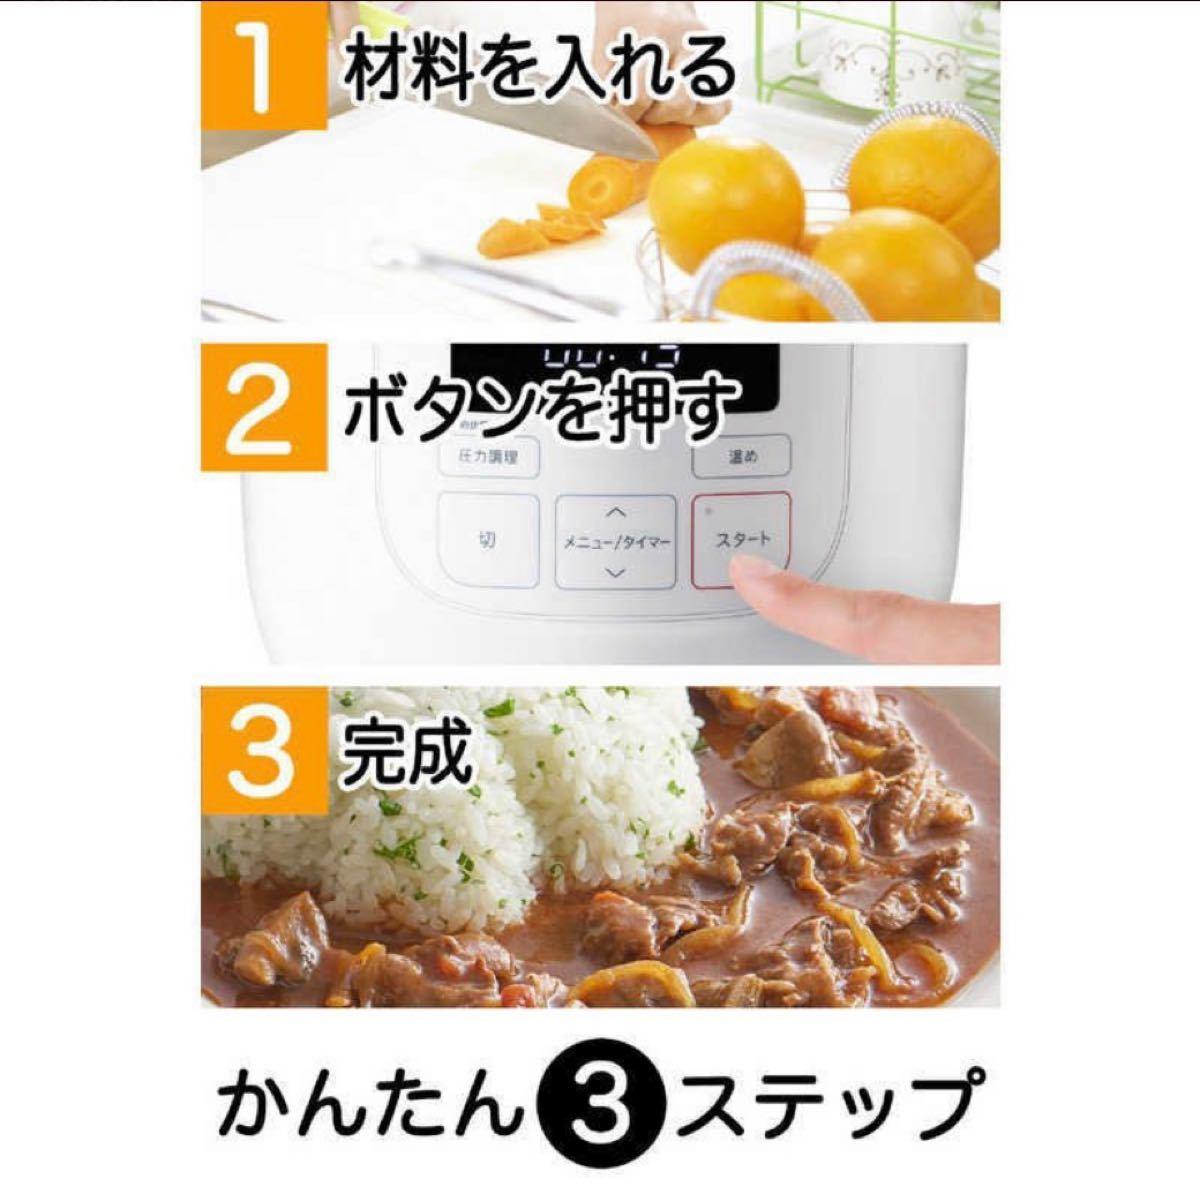 SIROCA 電気圧力鍋 [圧力/無水/蒸し/炊飯/温め直し/コンパクト] SP-D121(W)